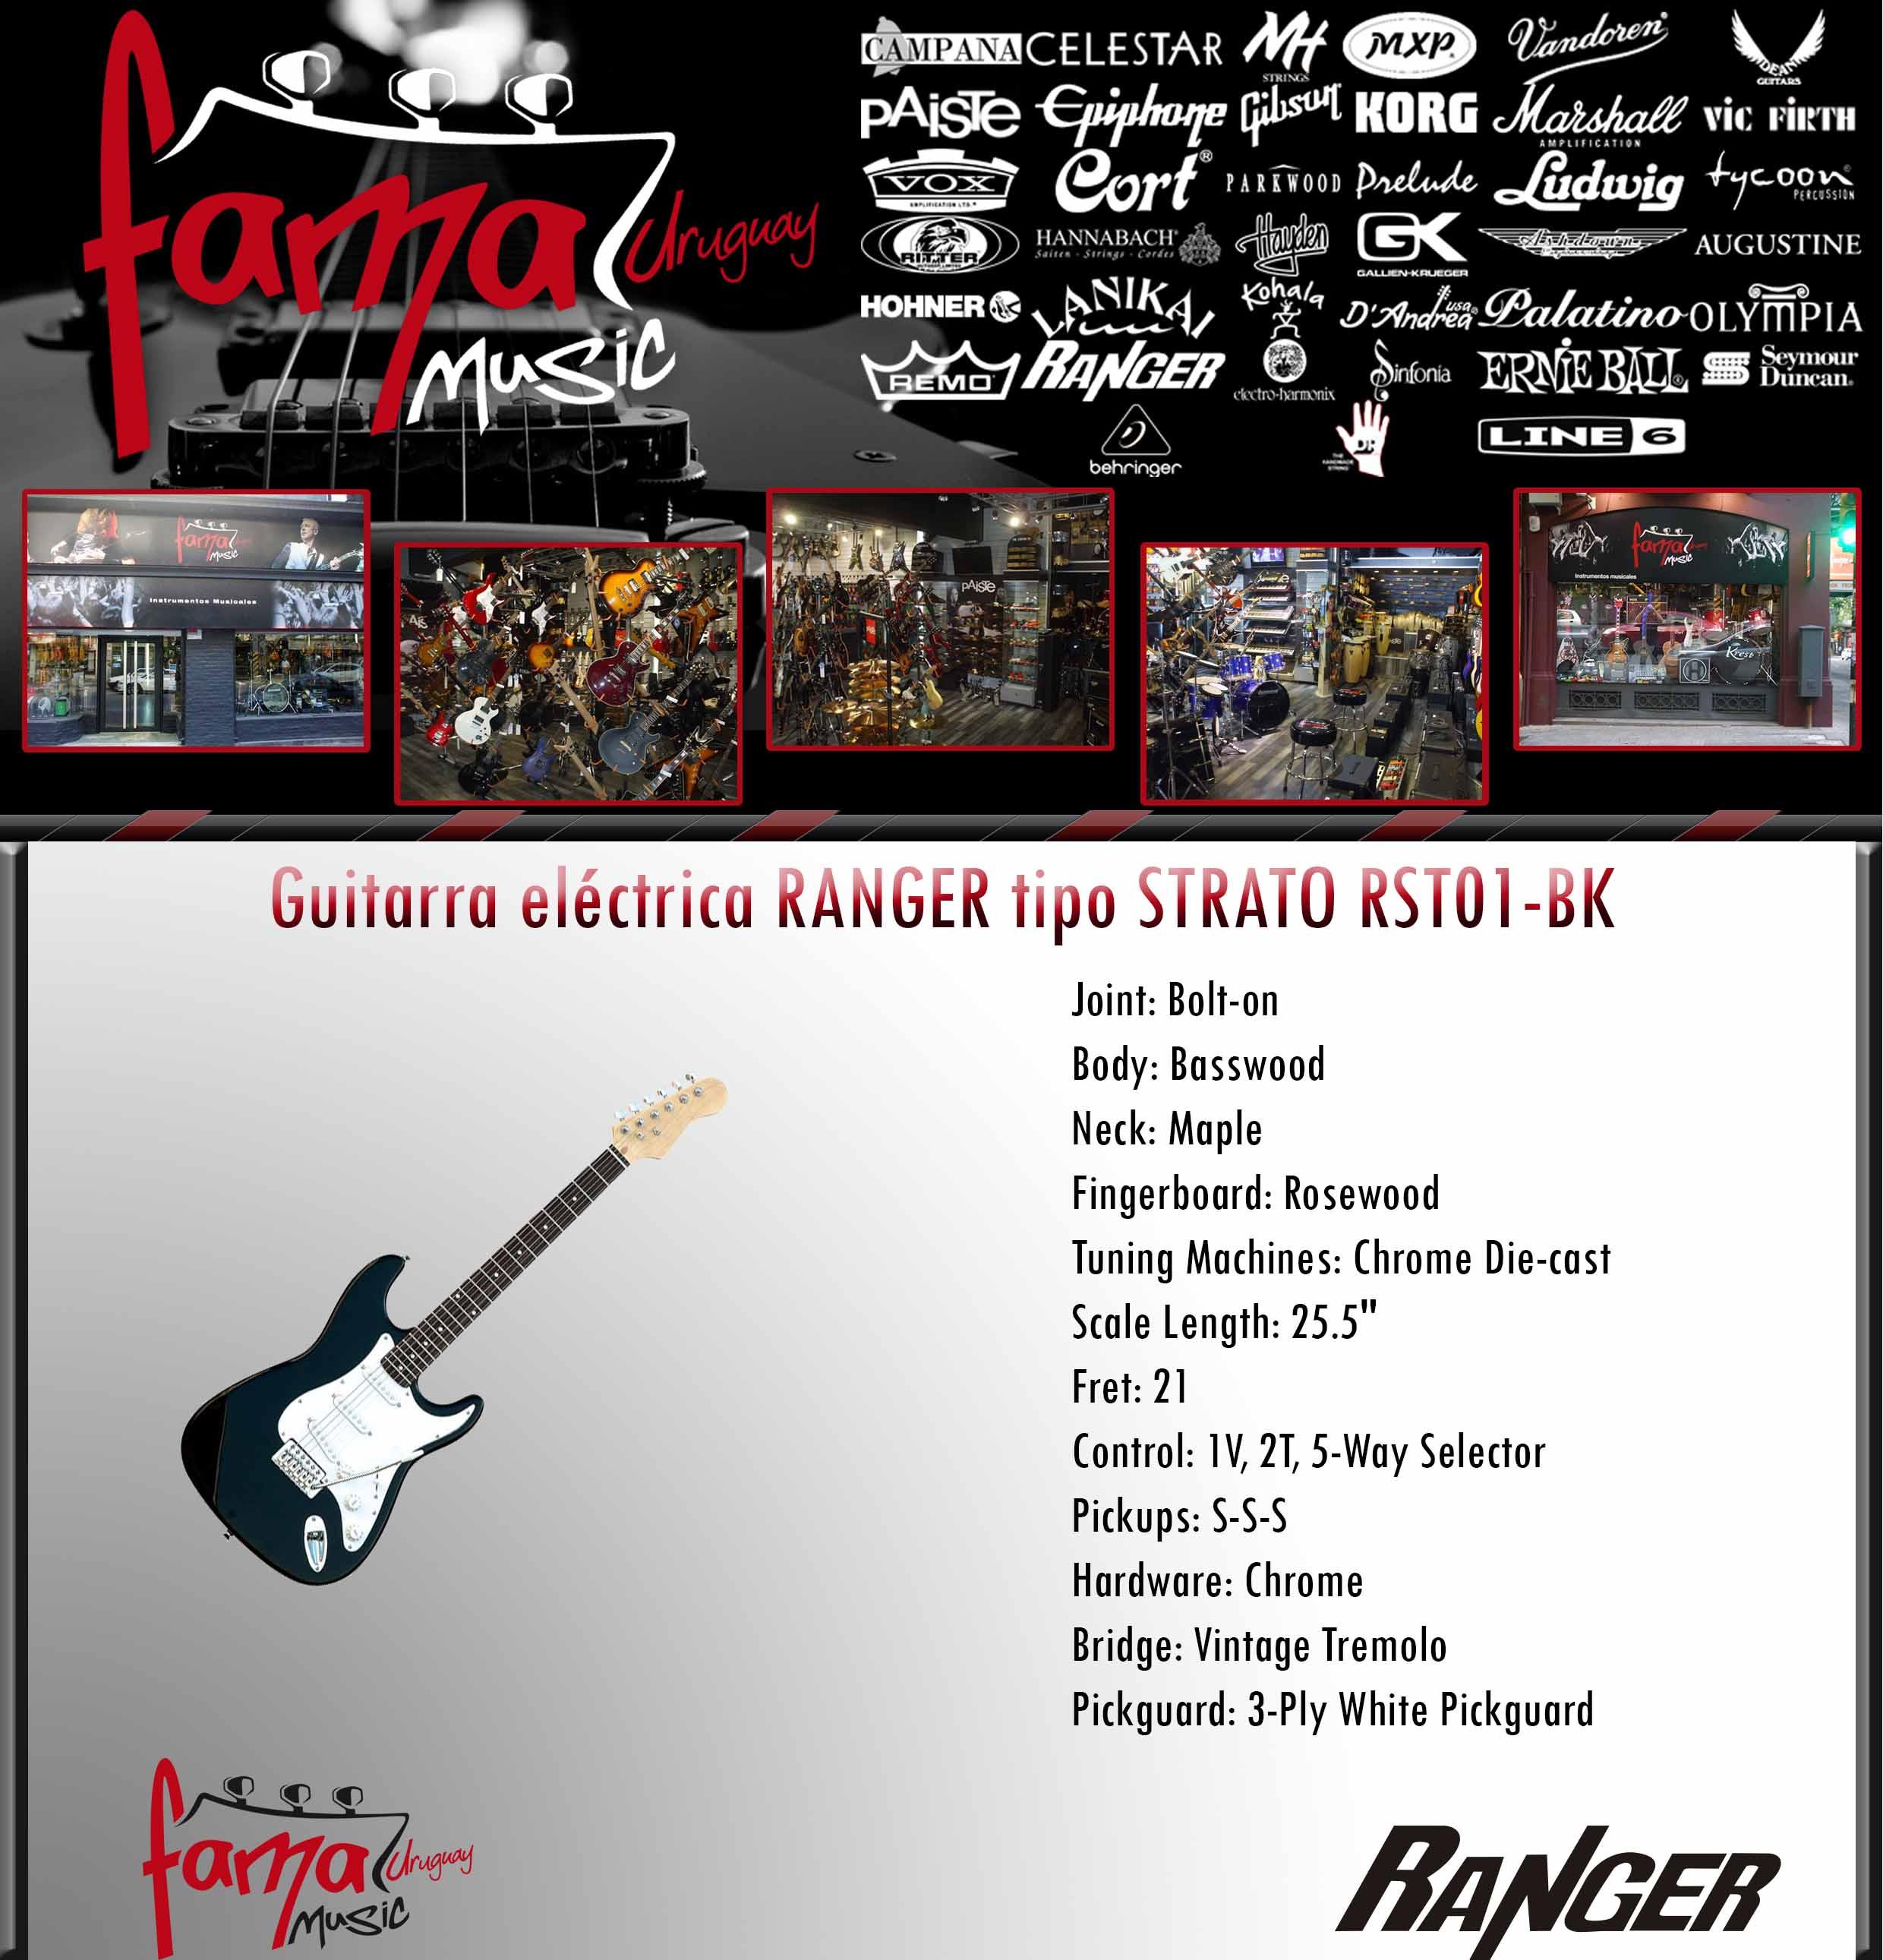 Guitarra eléctrica RANGER tipo STRATO RST01-BK